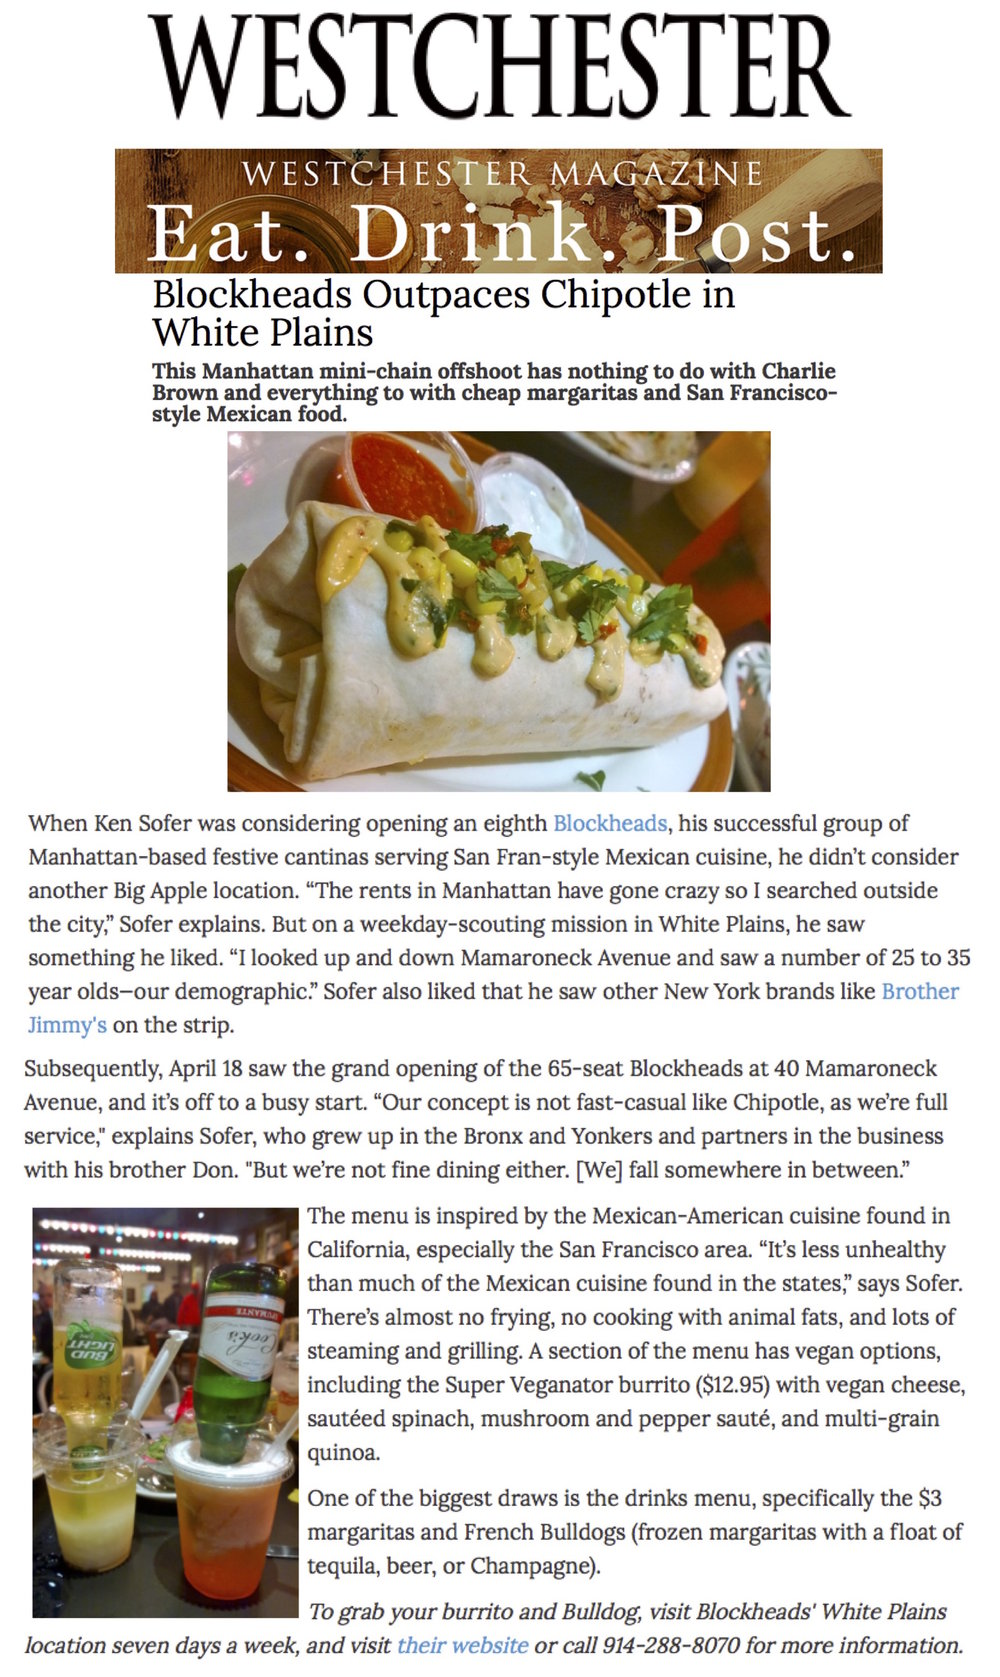 5-24-16_WestchesterMagazine_Blockheads copy.jpg